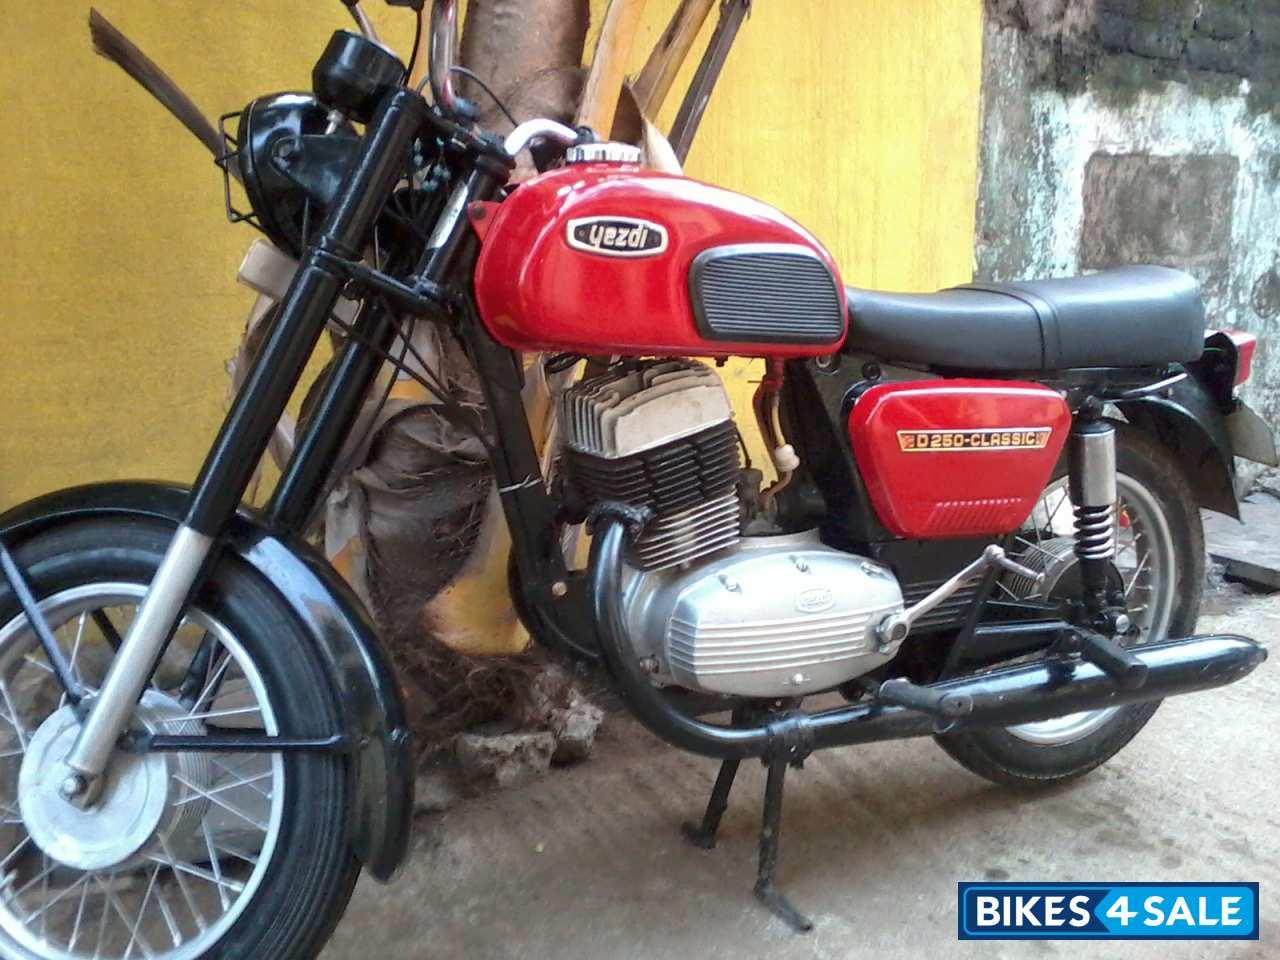 Second hand Ideal Jawa Yezdi Classic in Chennai. Hi. if u r interested ...